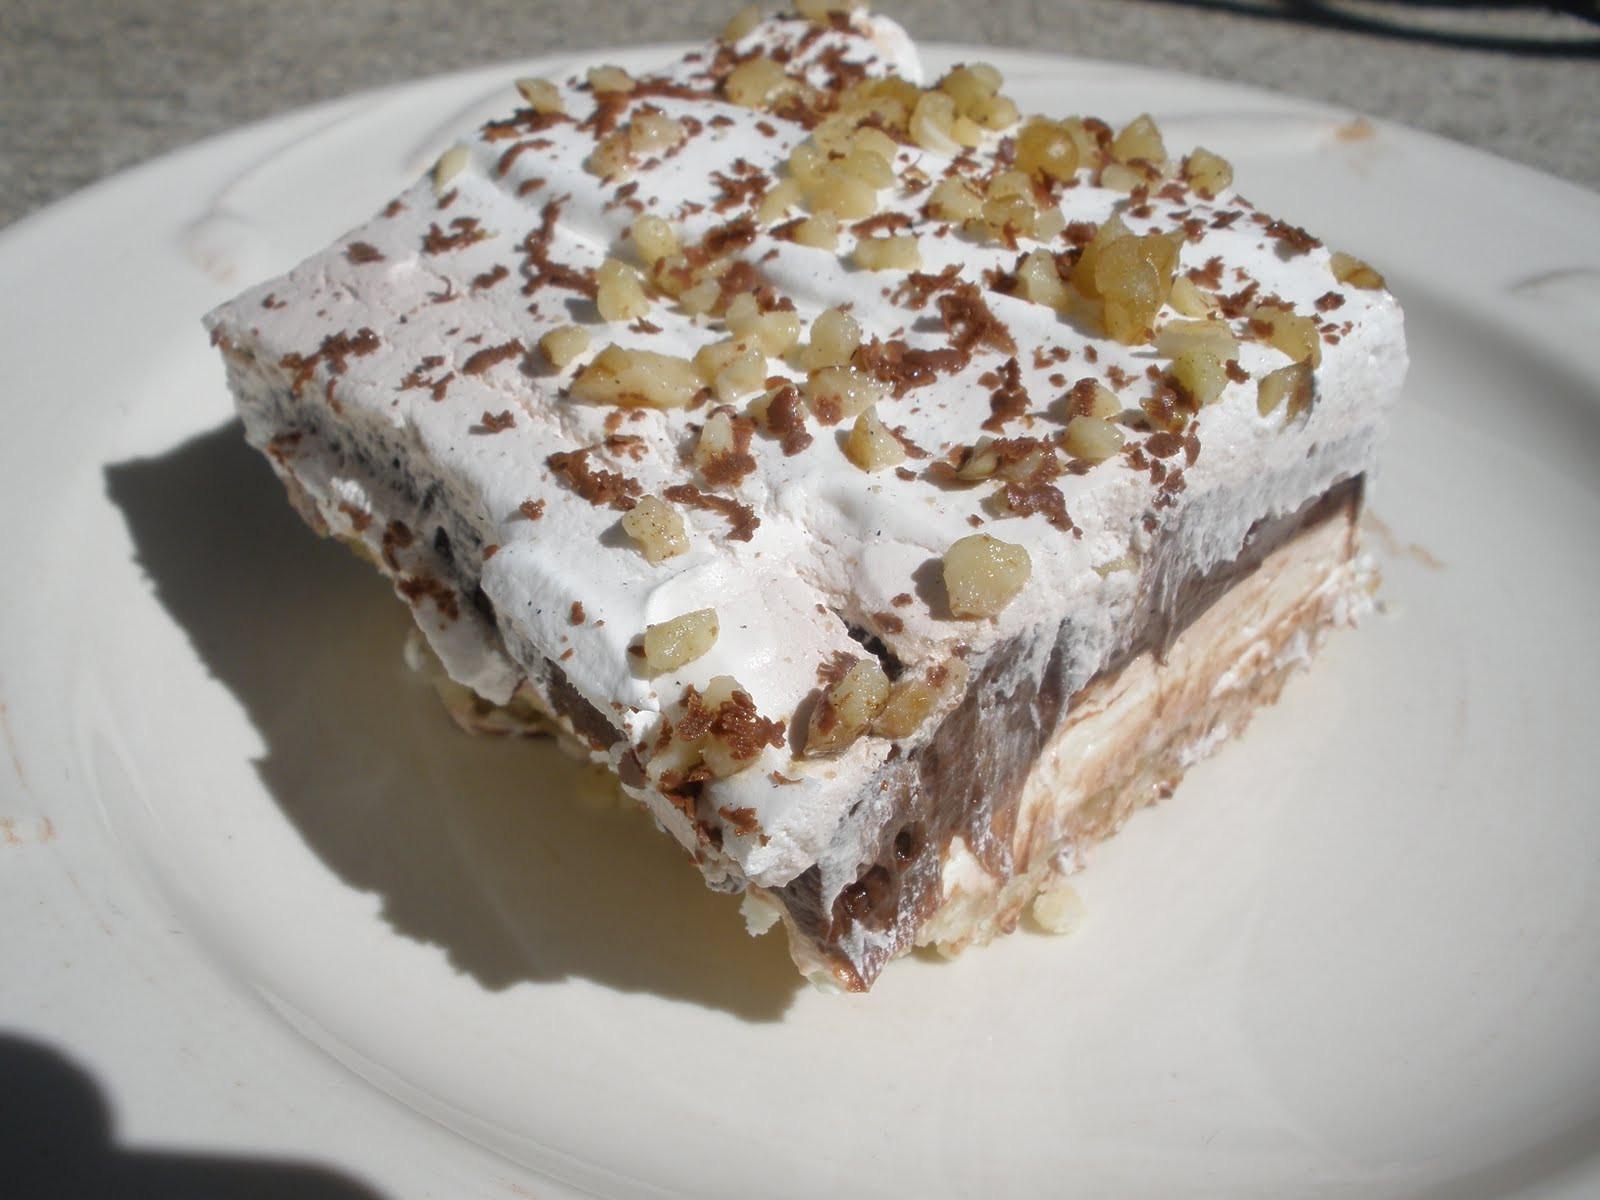 Pudding Dessert Recipe  FOR THE LOVE OF FOOD Dessert Chocolate Pudding Dessert